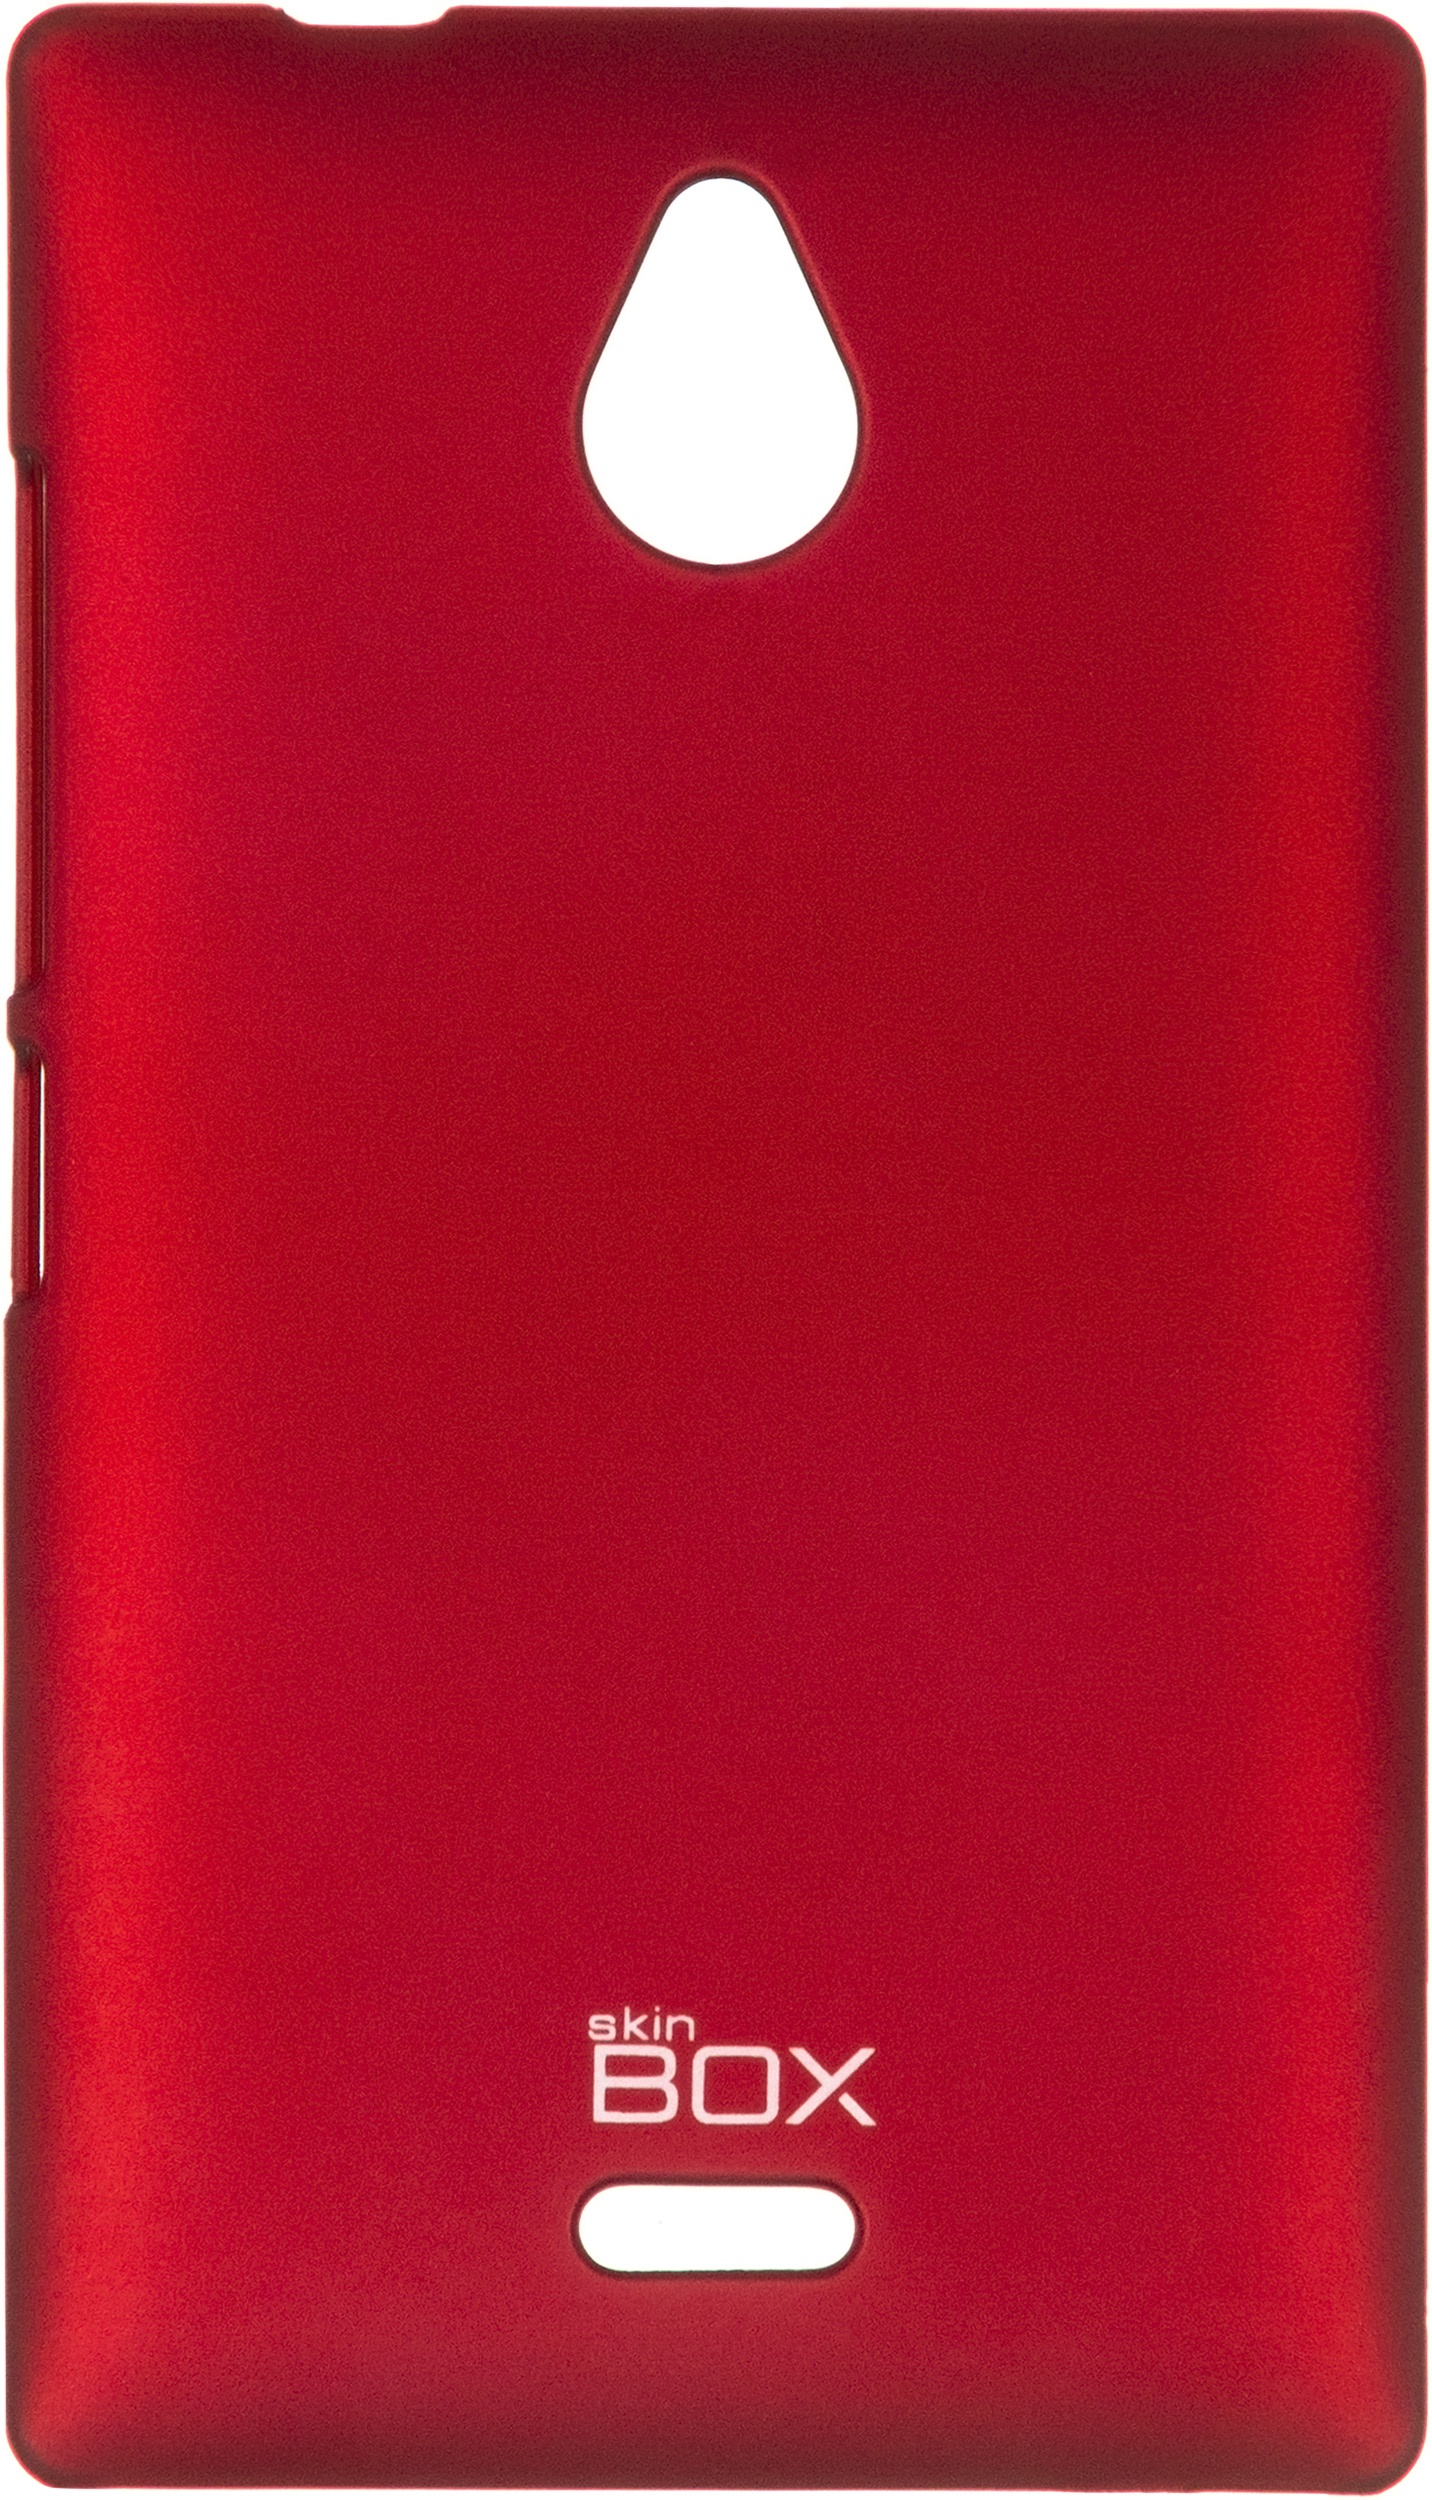 Чехол для сотового телефона skinBOX 4People, 4630042526556, красный аксессуар чехол asus zenfone 3 zc551kl skinbox 4people red t s azzc551kl 002 защитная пленка